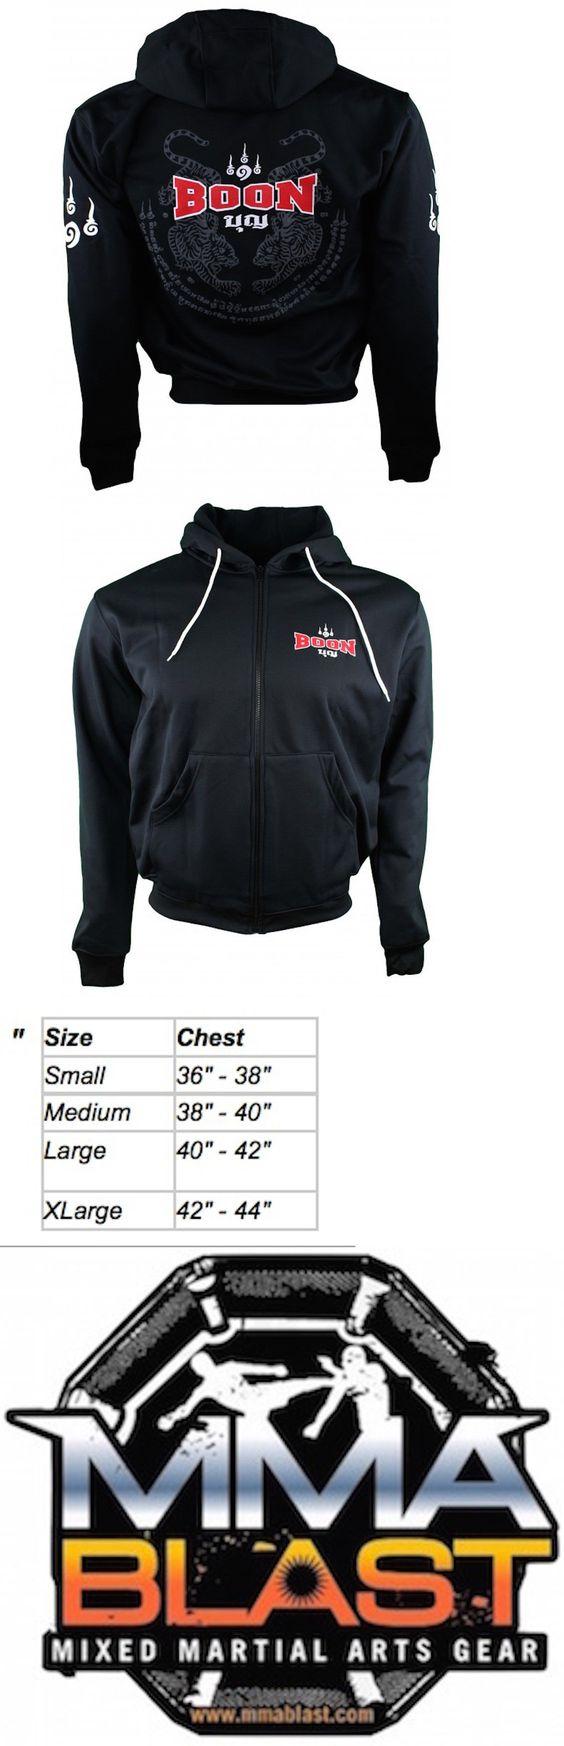 Shirt design supplies - Other Combat Sport Supplies 16044 Boon Sport Tiger Sak Tattoo Hoodie Sweatshirt 100